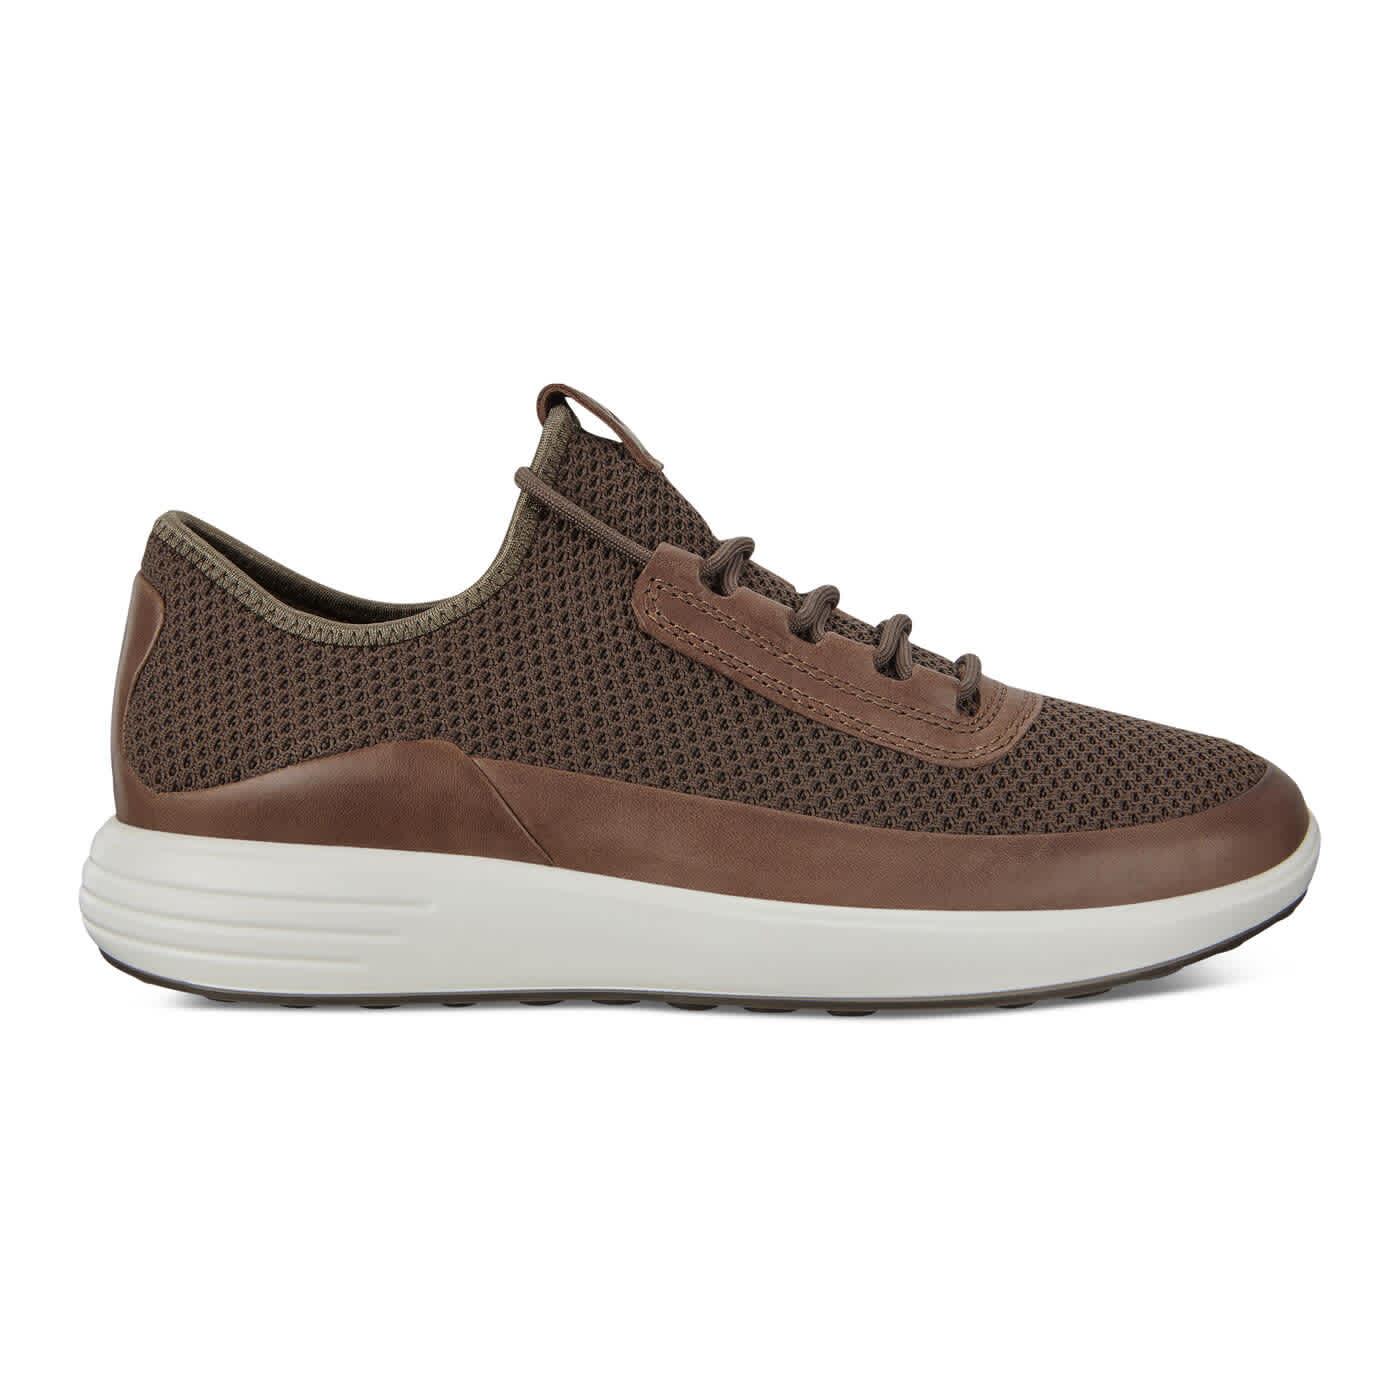 Ecco Men's and Women's Shoes